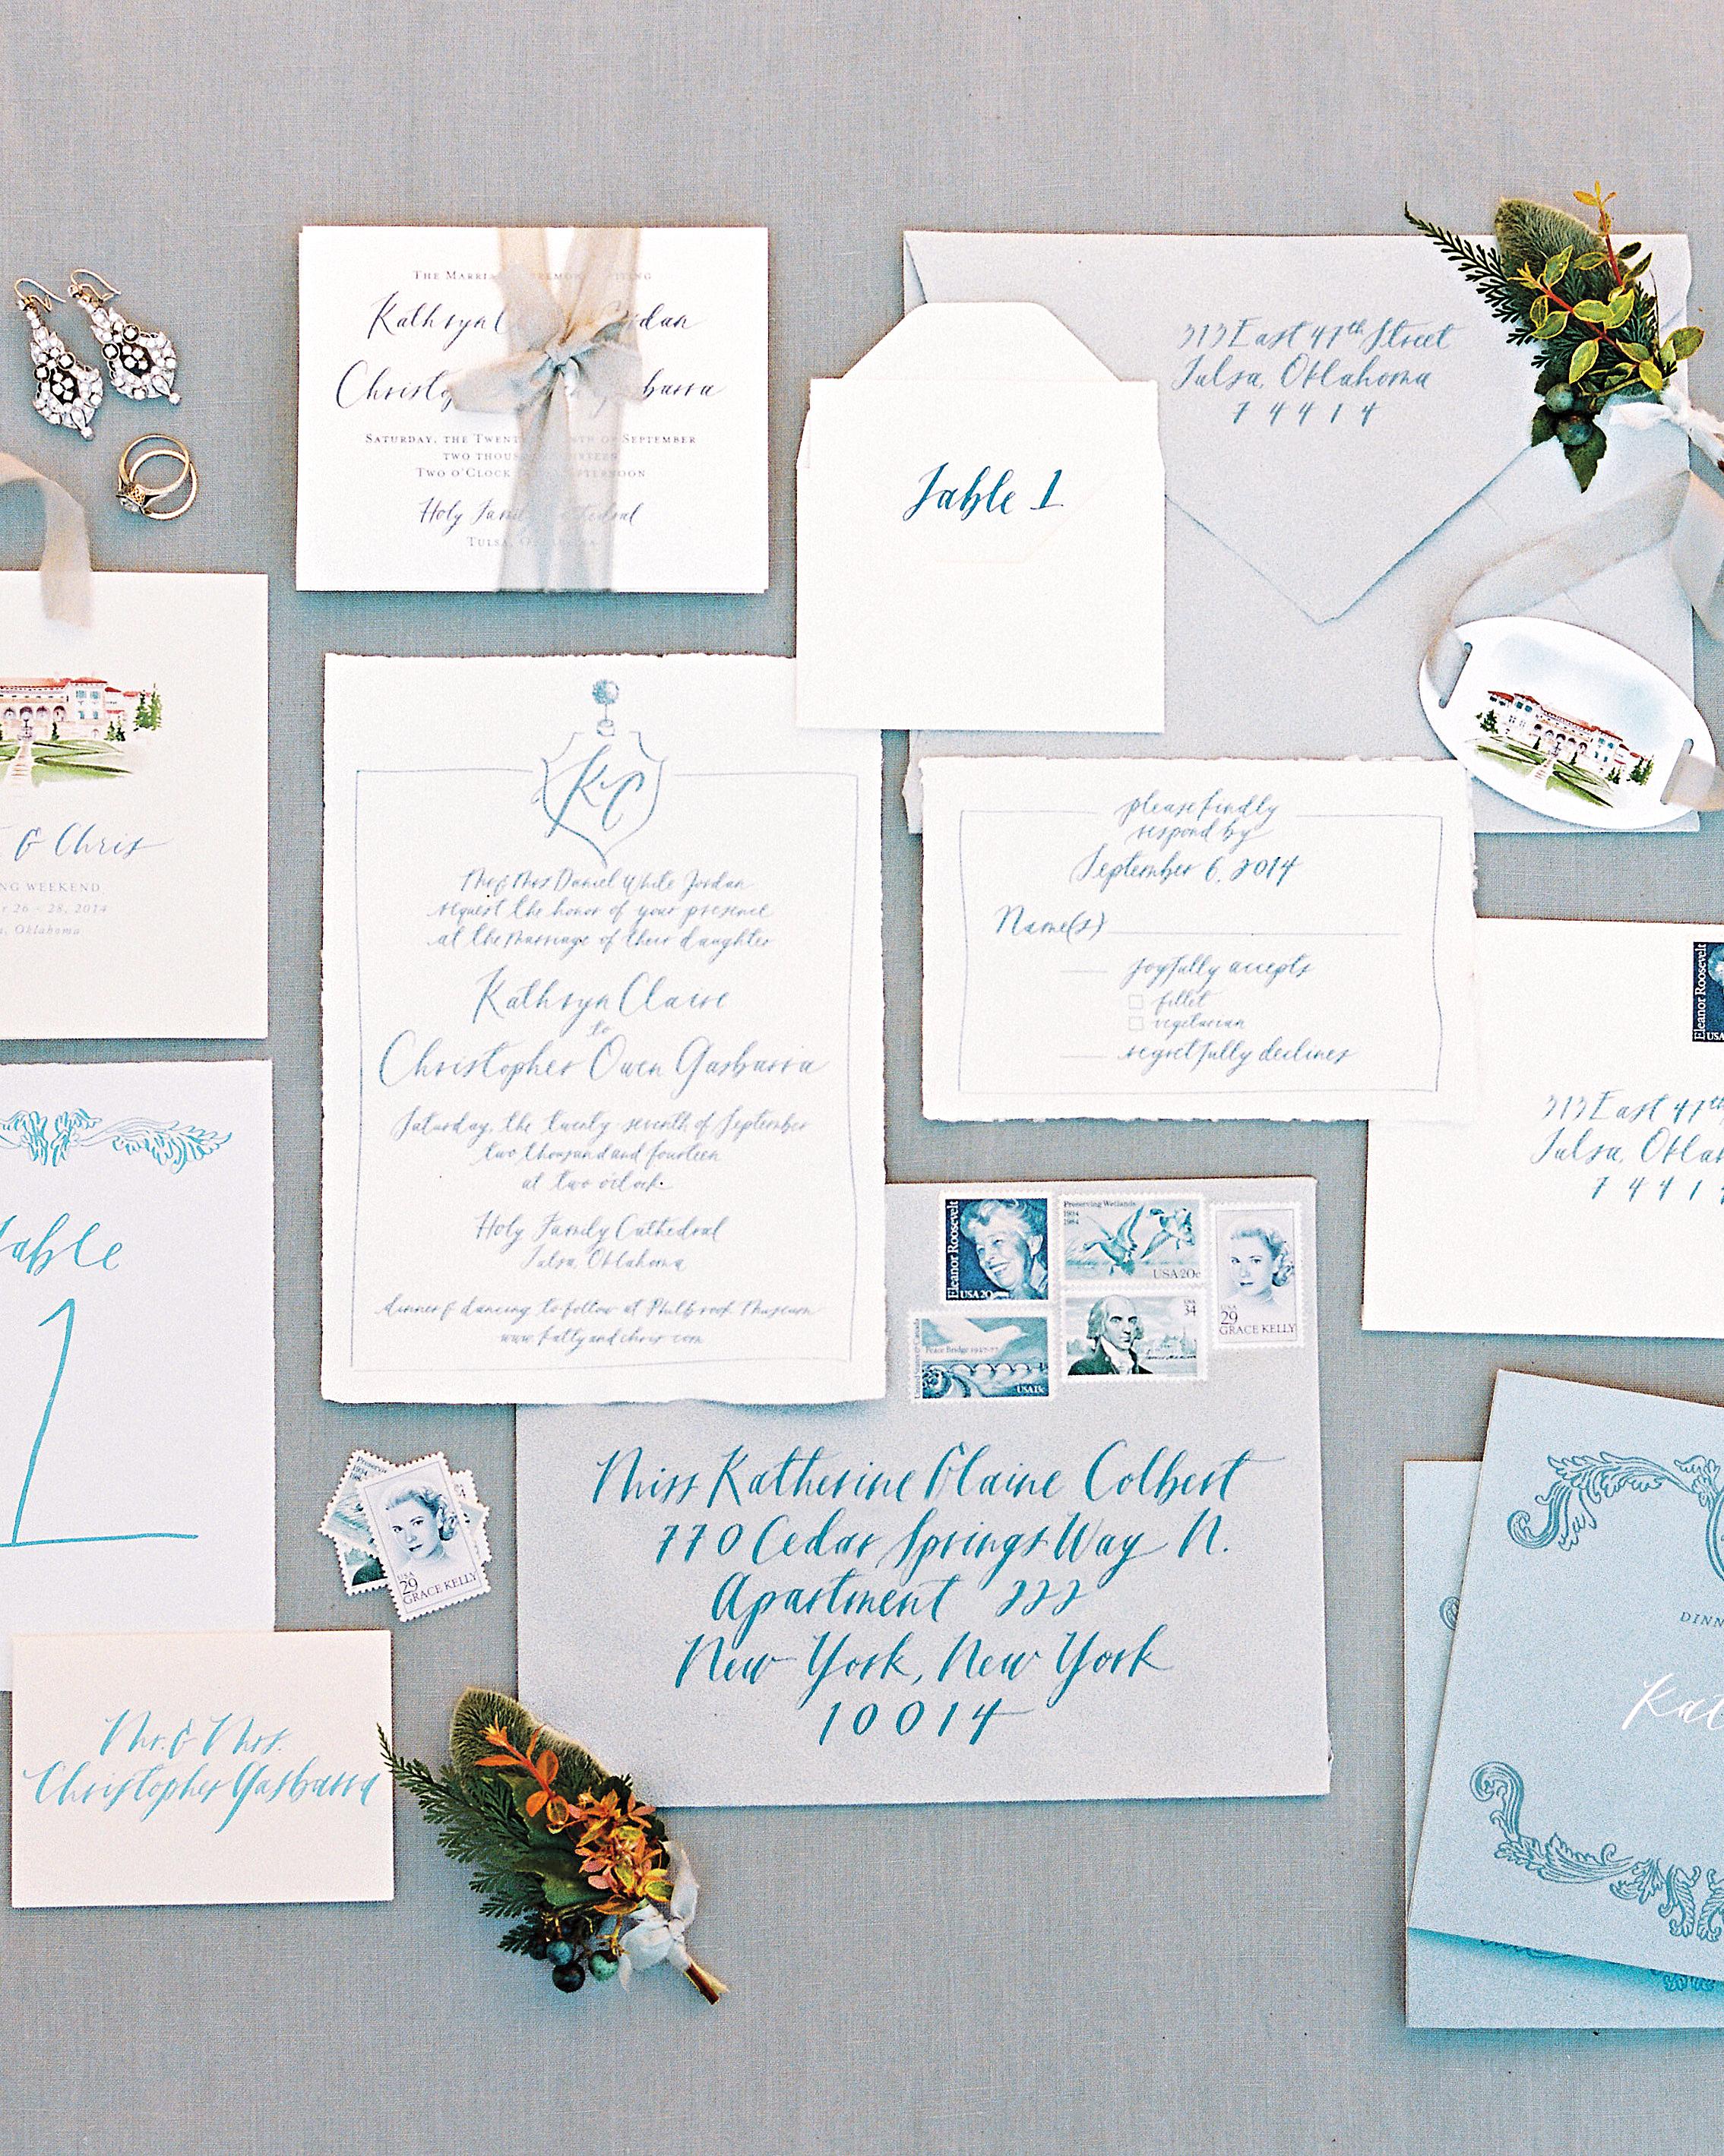 katty-chris-wedding-tulsa-oklahoma-w016a-s112049.jpg